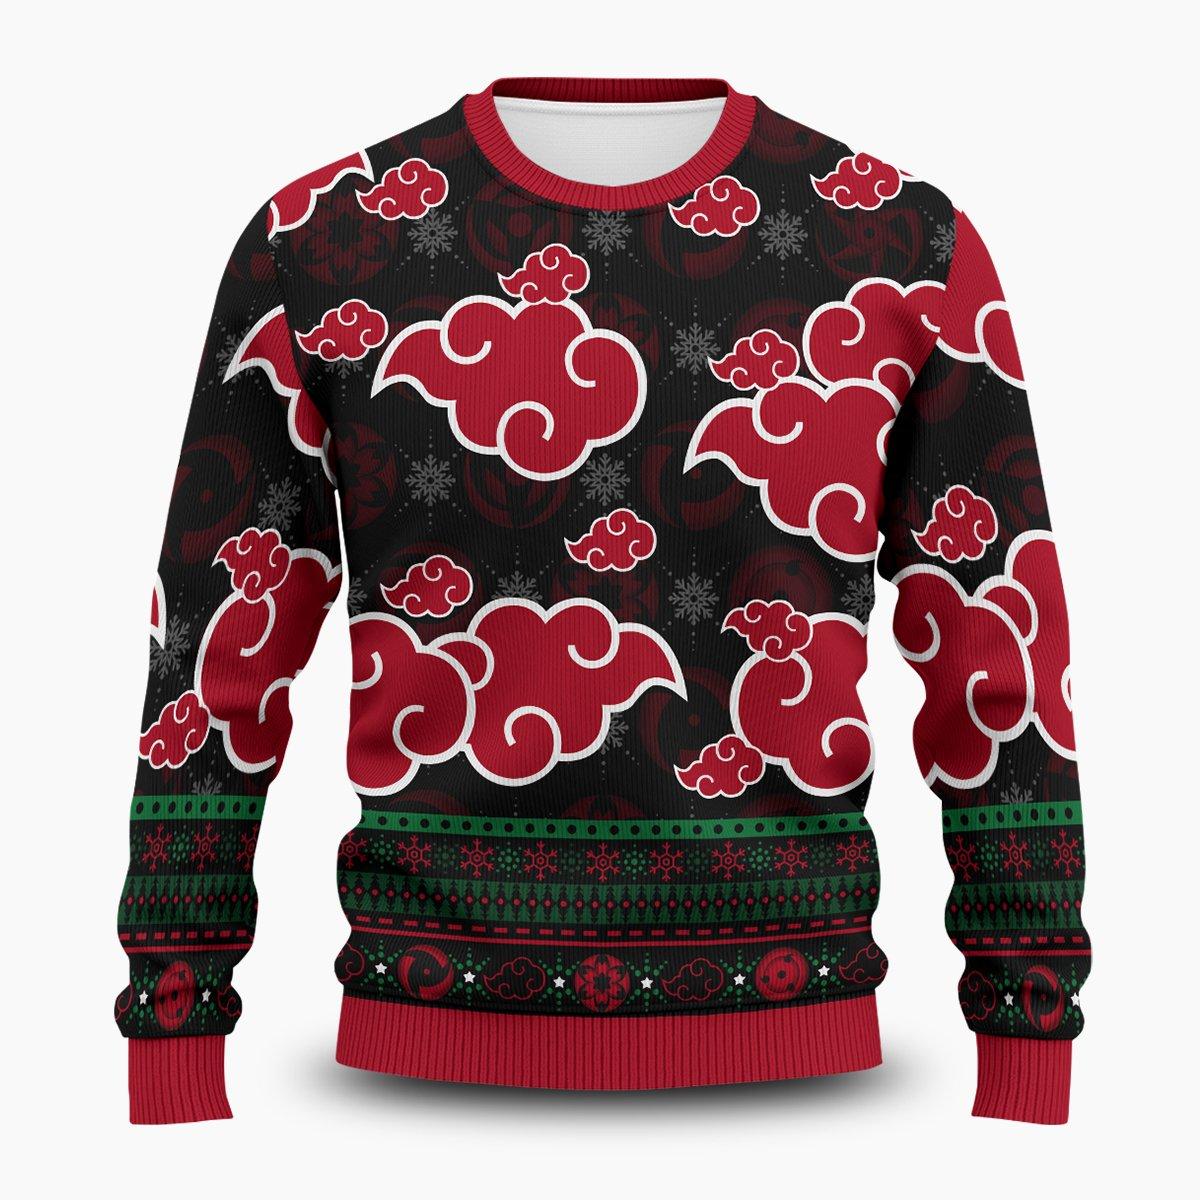 Akatsuki Sharingan Unisex Wool Sweater FDM0310 S Official Otaku Treat Merch